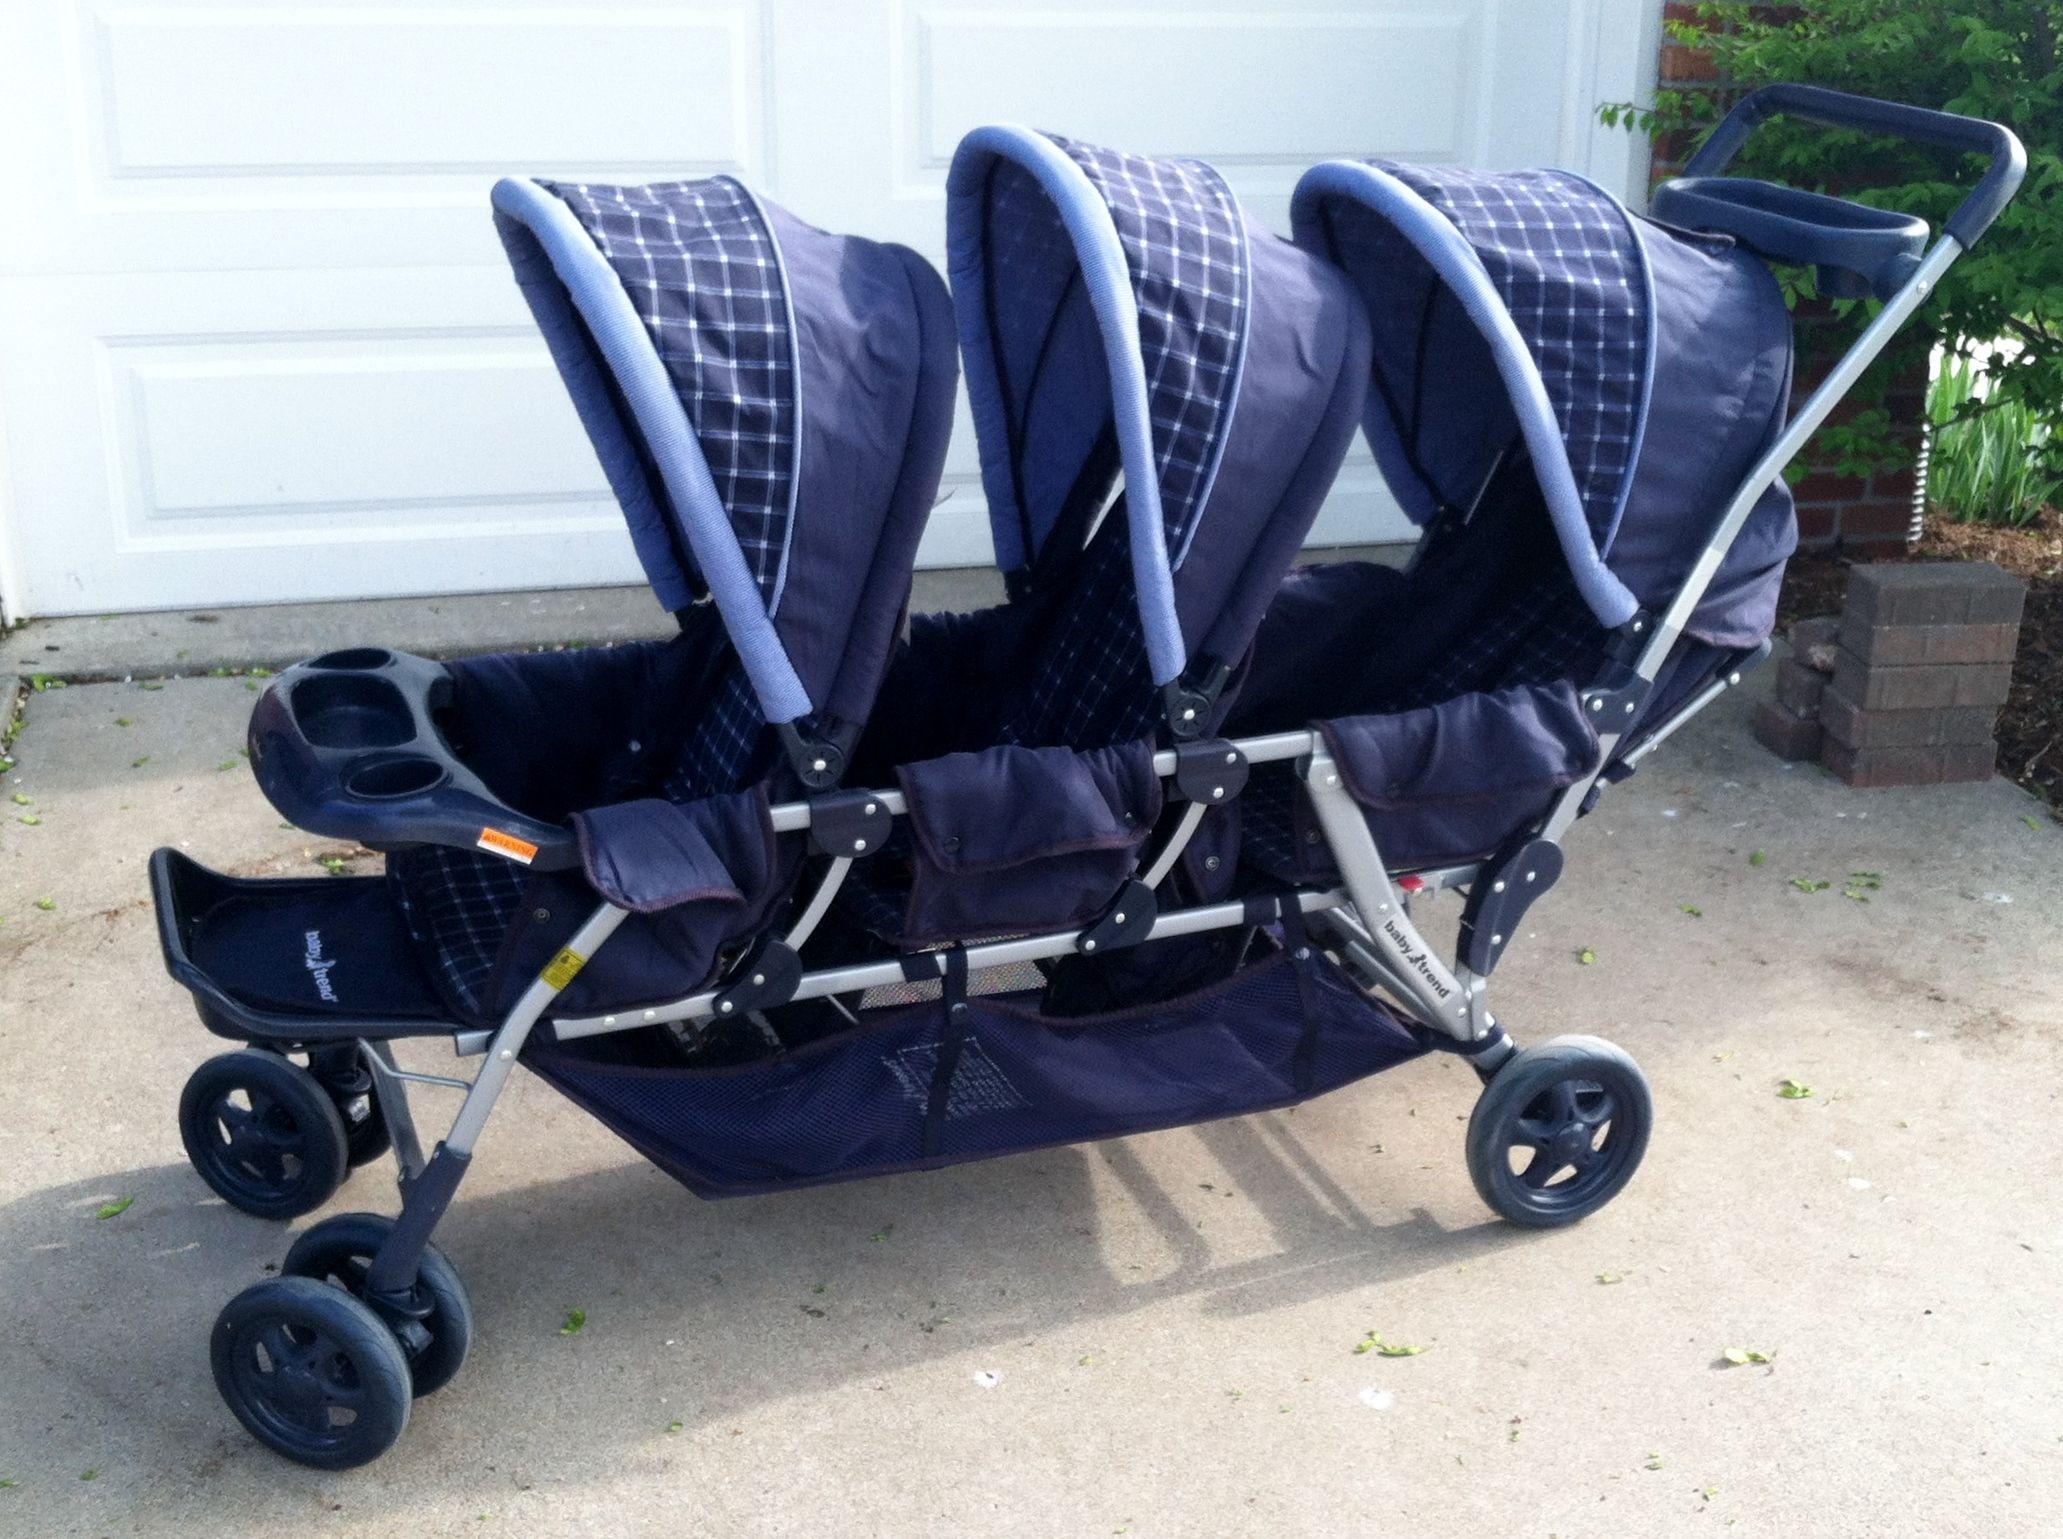 Baby Trend Triplet Stroller in EdsGarageSales Sale in